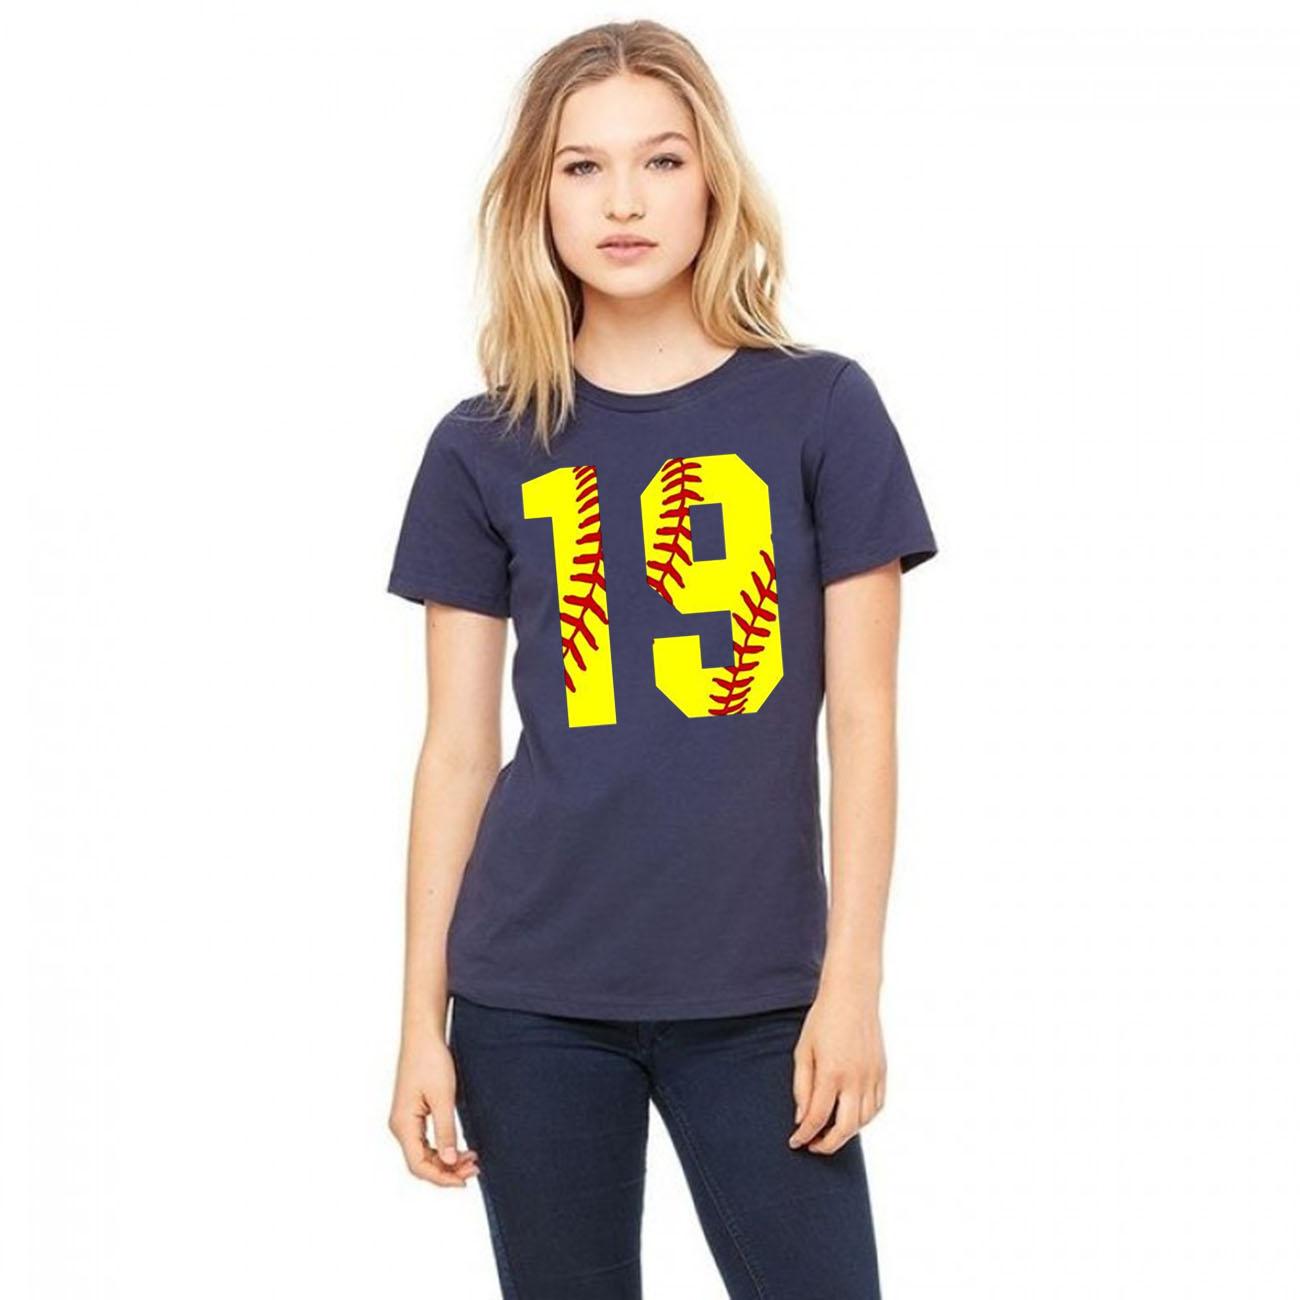 #19 Birthday Girl Softball Mom Fastpitch Softball Jersey Classic T-Shirt